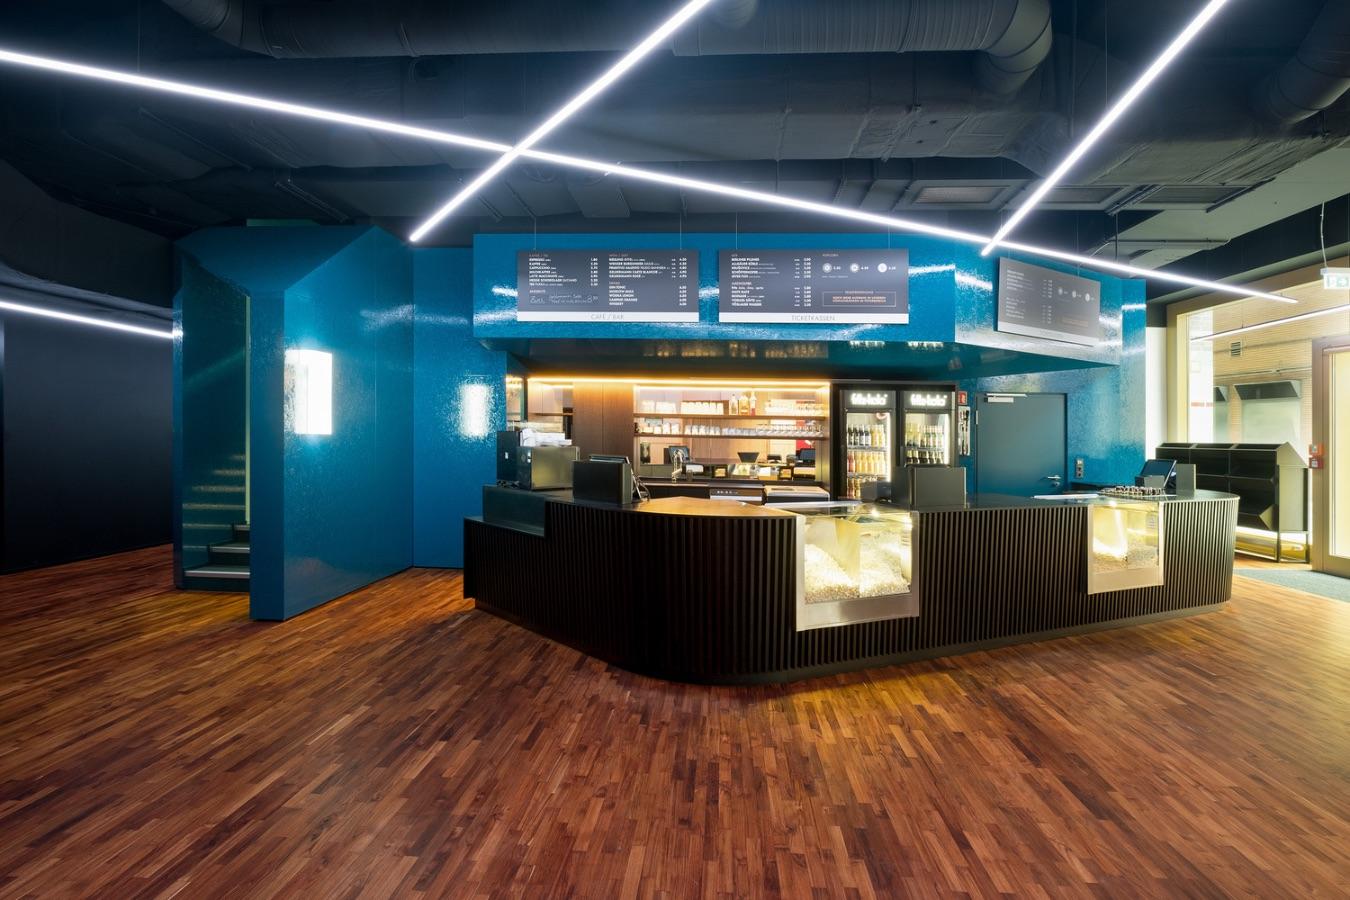 2_Delphi LUX Cinema_Batek Architekten+Ester Bruzkus Architekten_Inspirationist